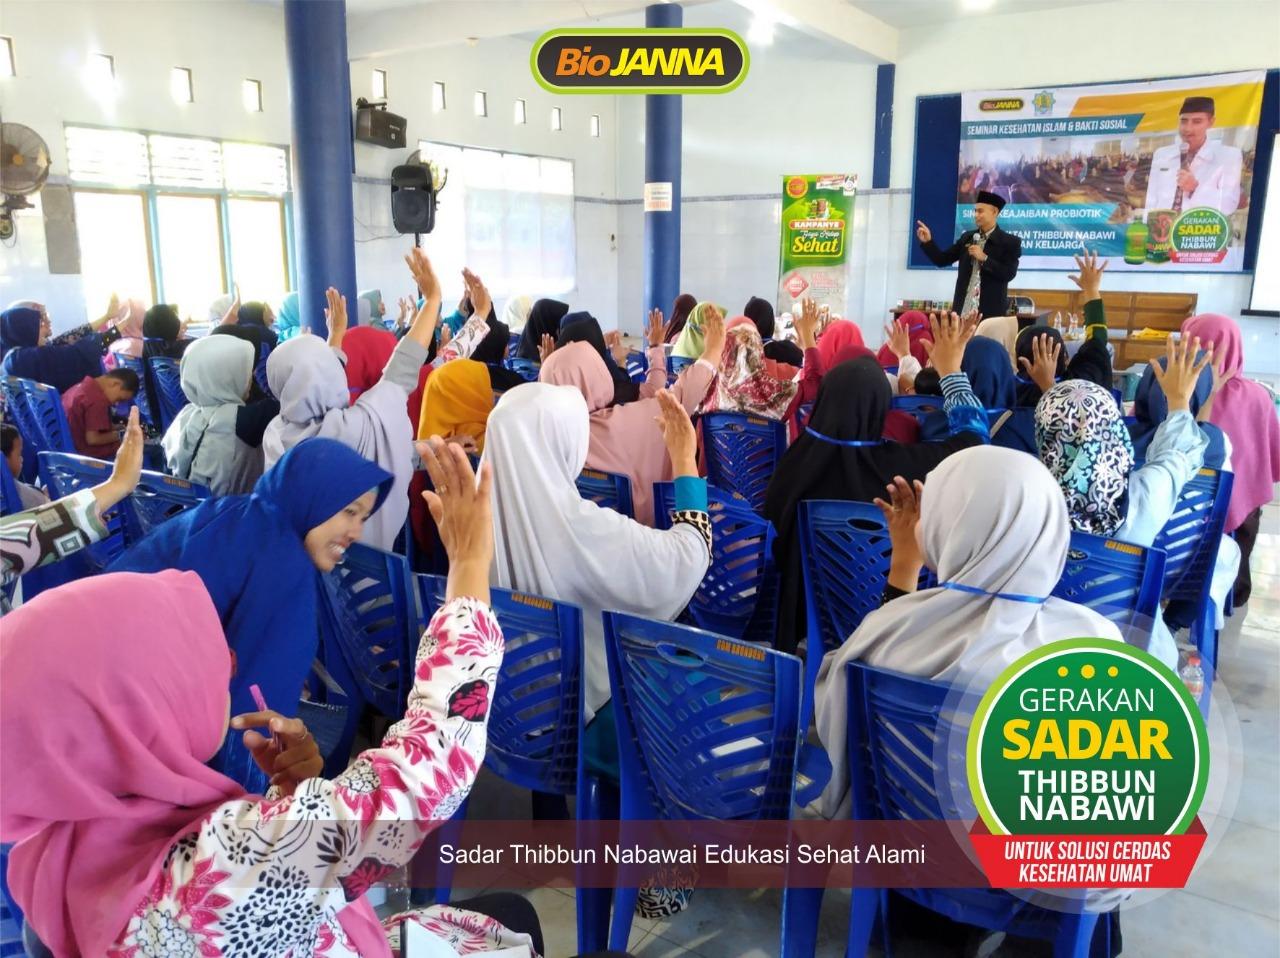 seminar biojanna dan bakti sosial